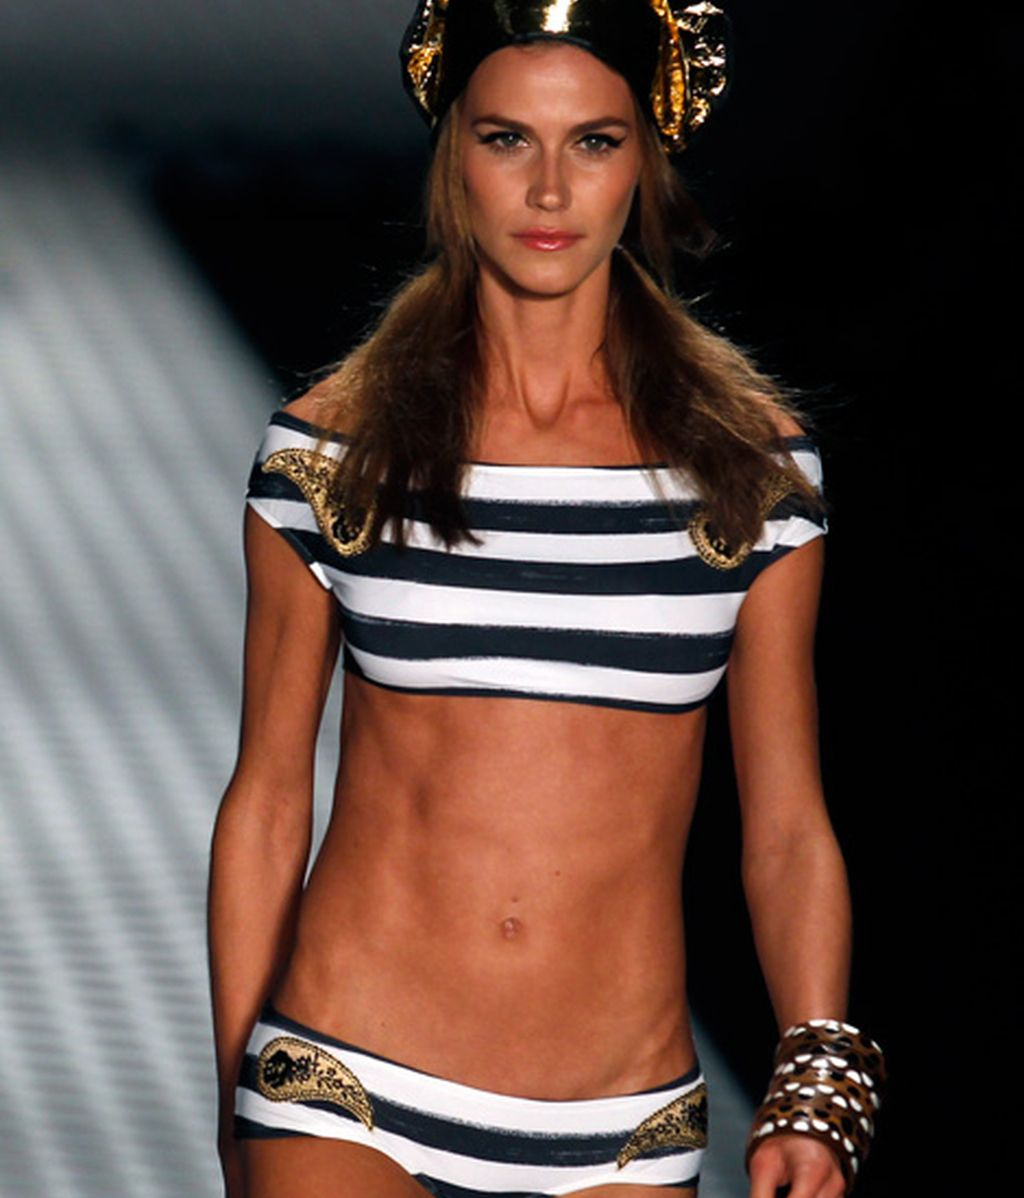 La Semana de la Moda en Río de Janeiro